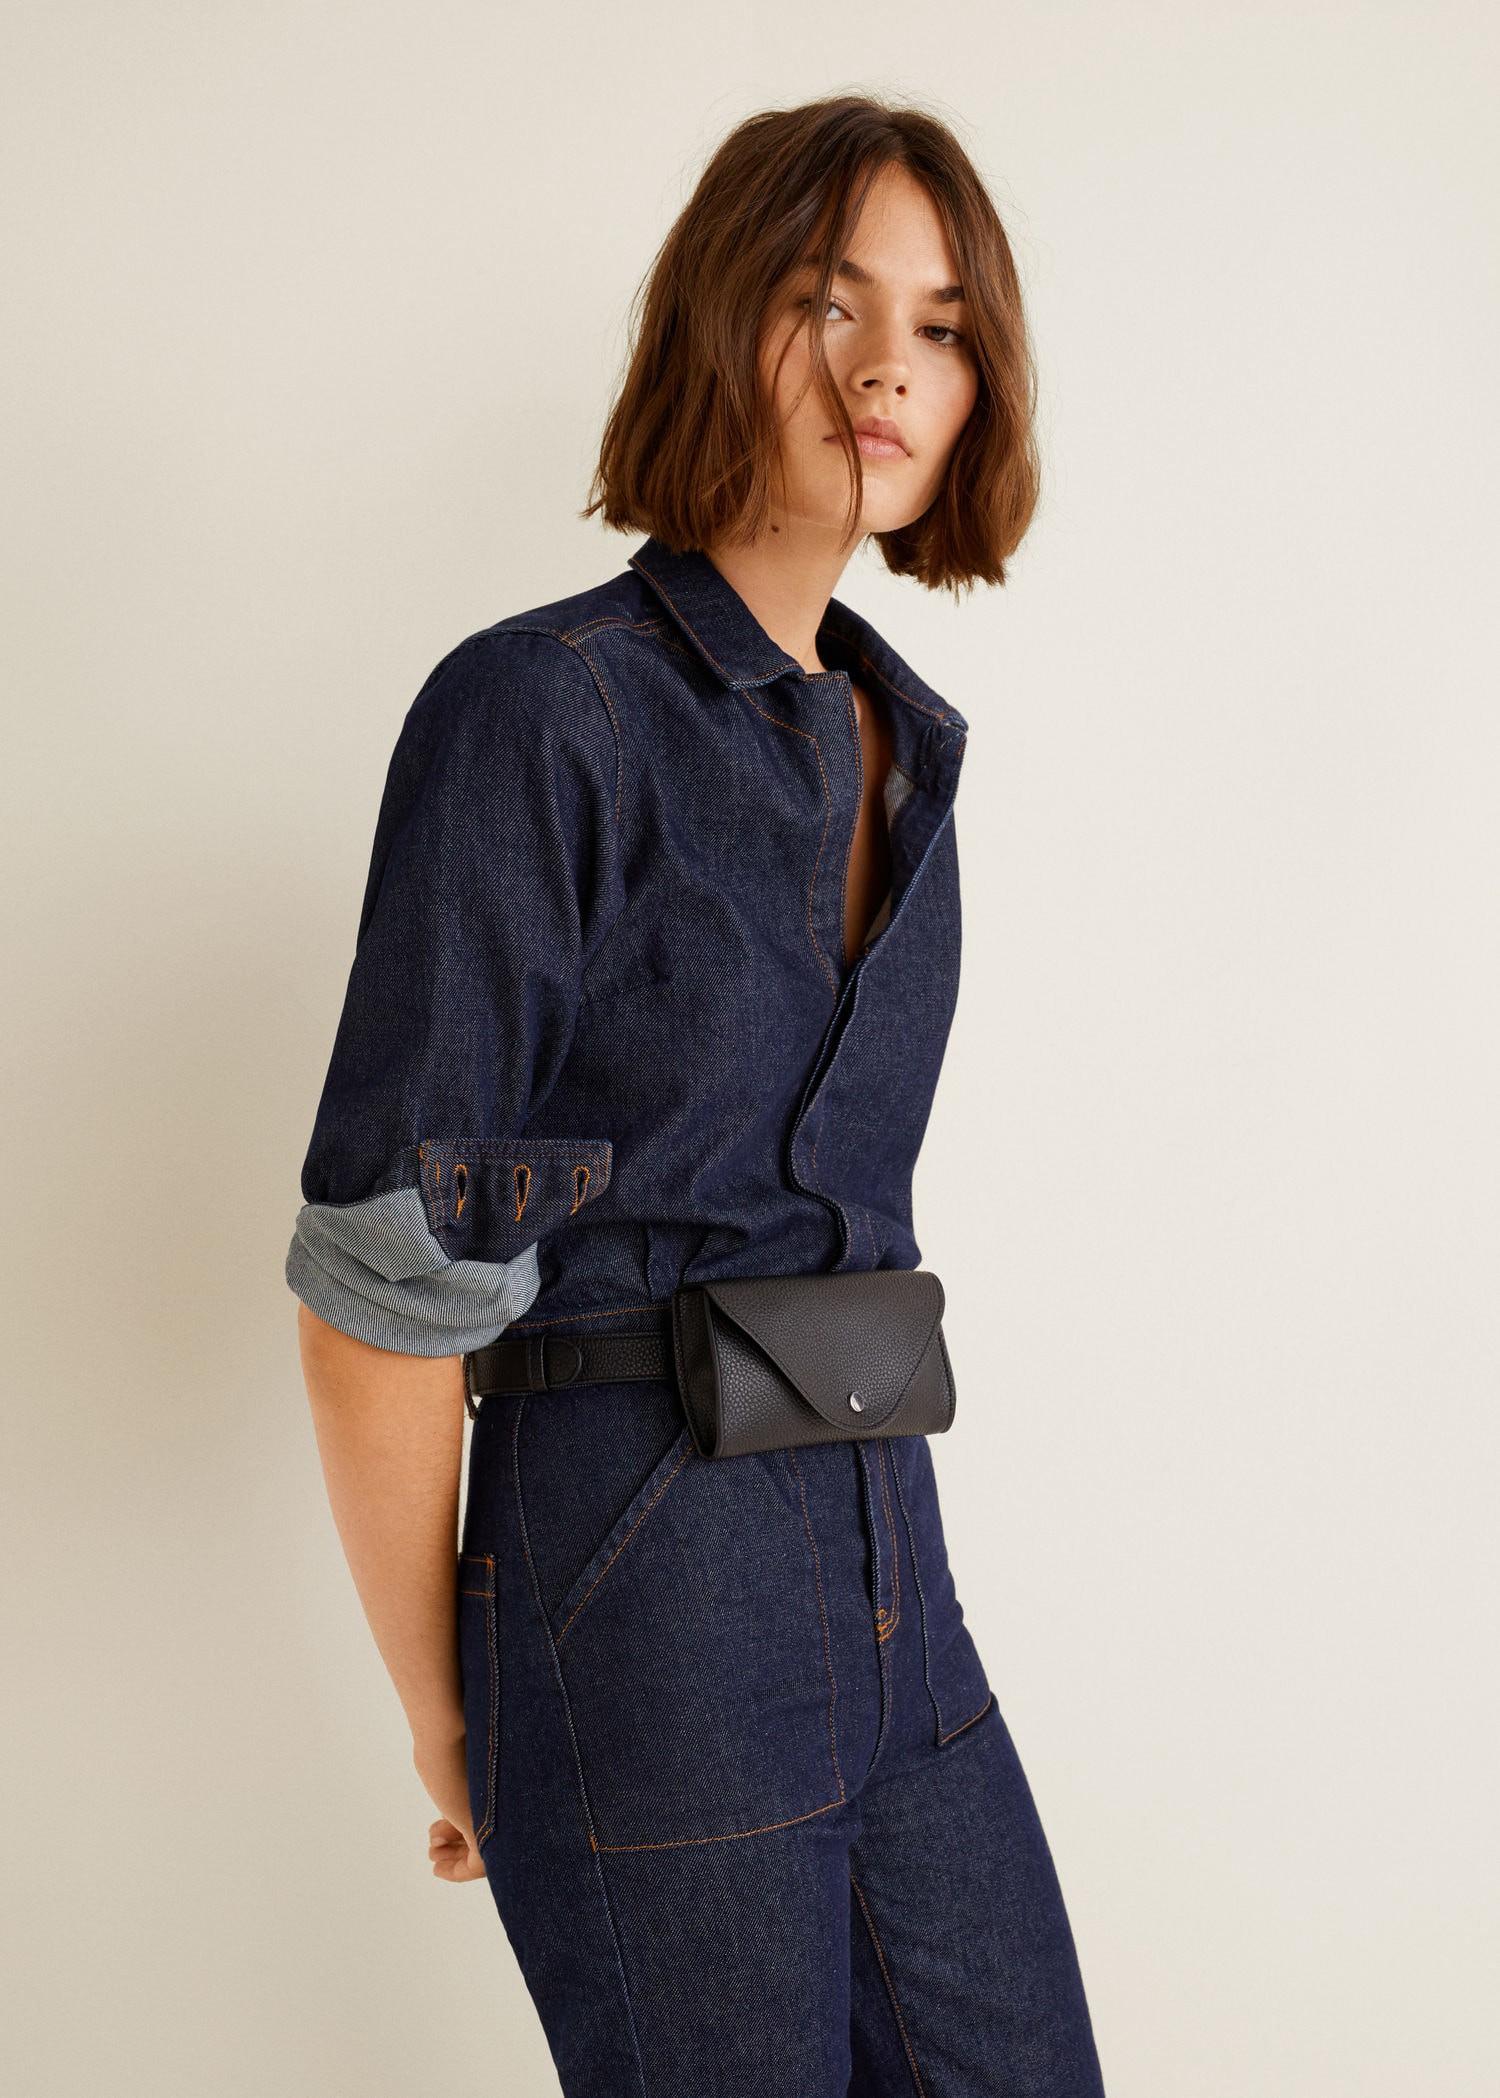 d117bd551491 Mango Flap Belt Bag - Black One Size   Products   Mango bags, Bags ...